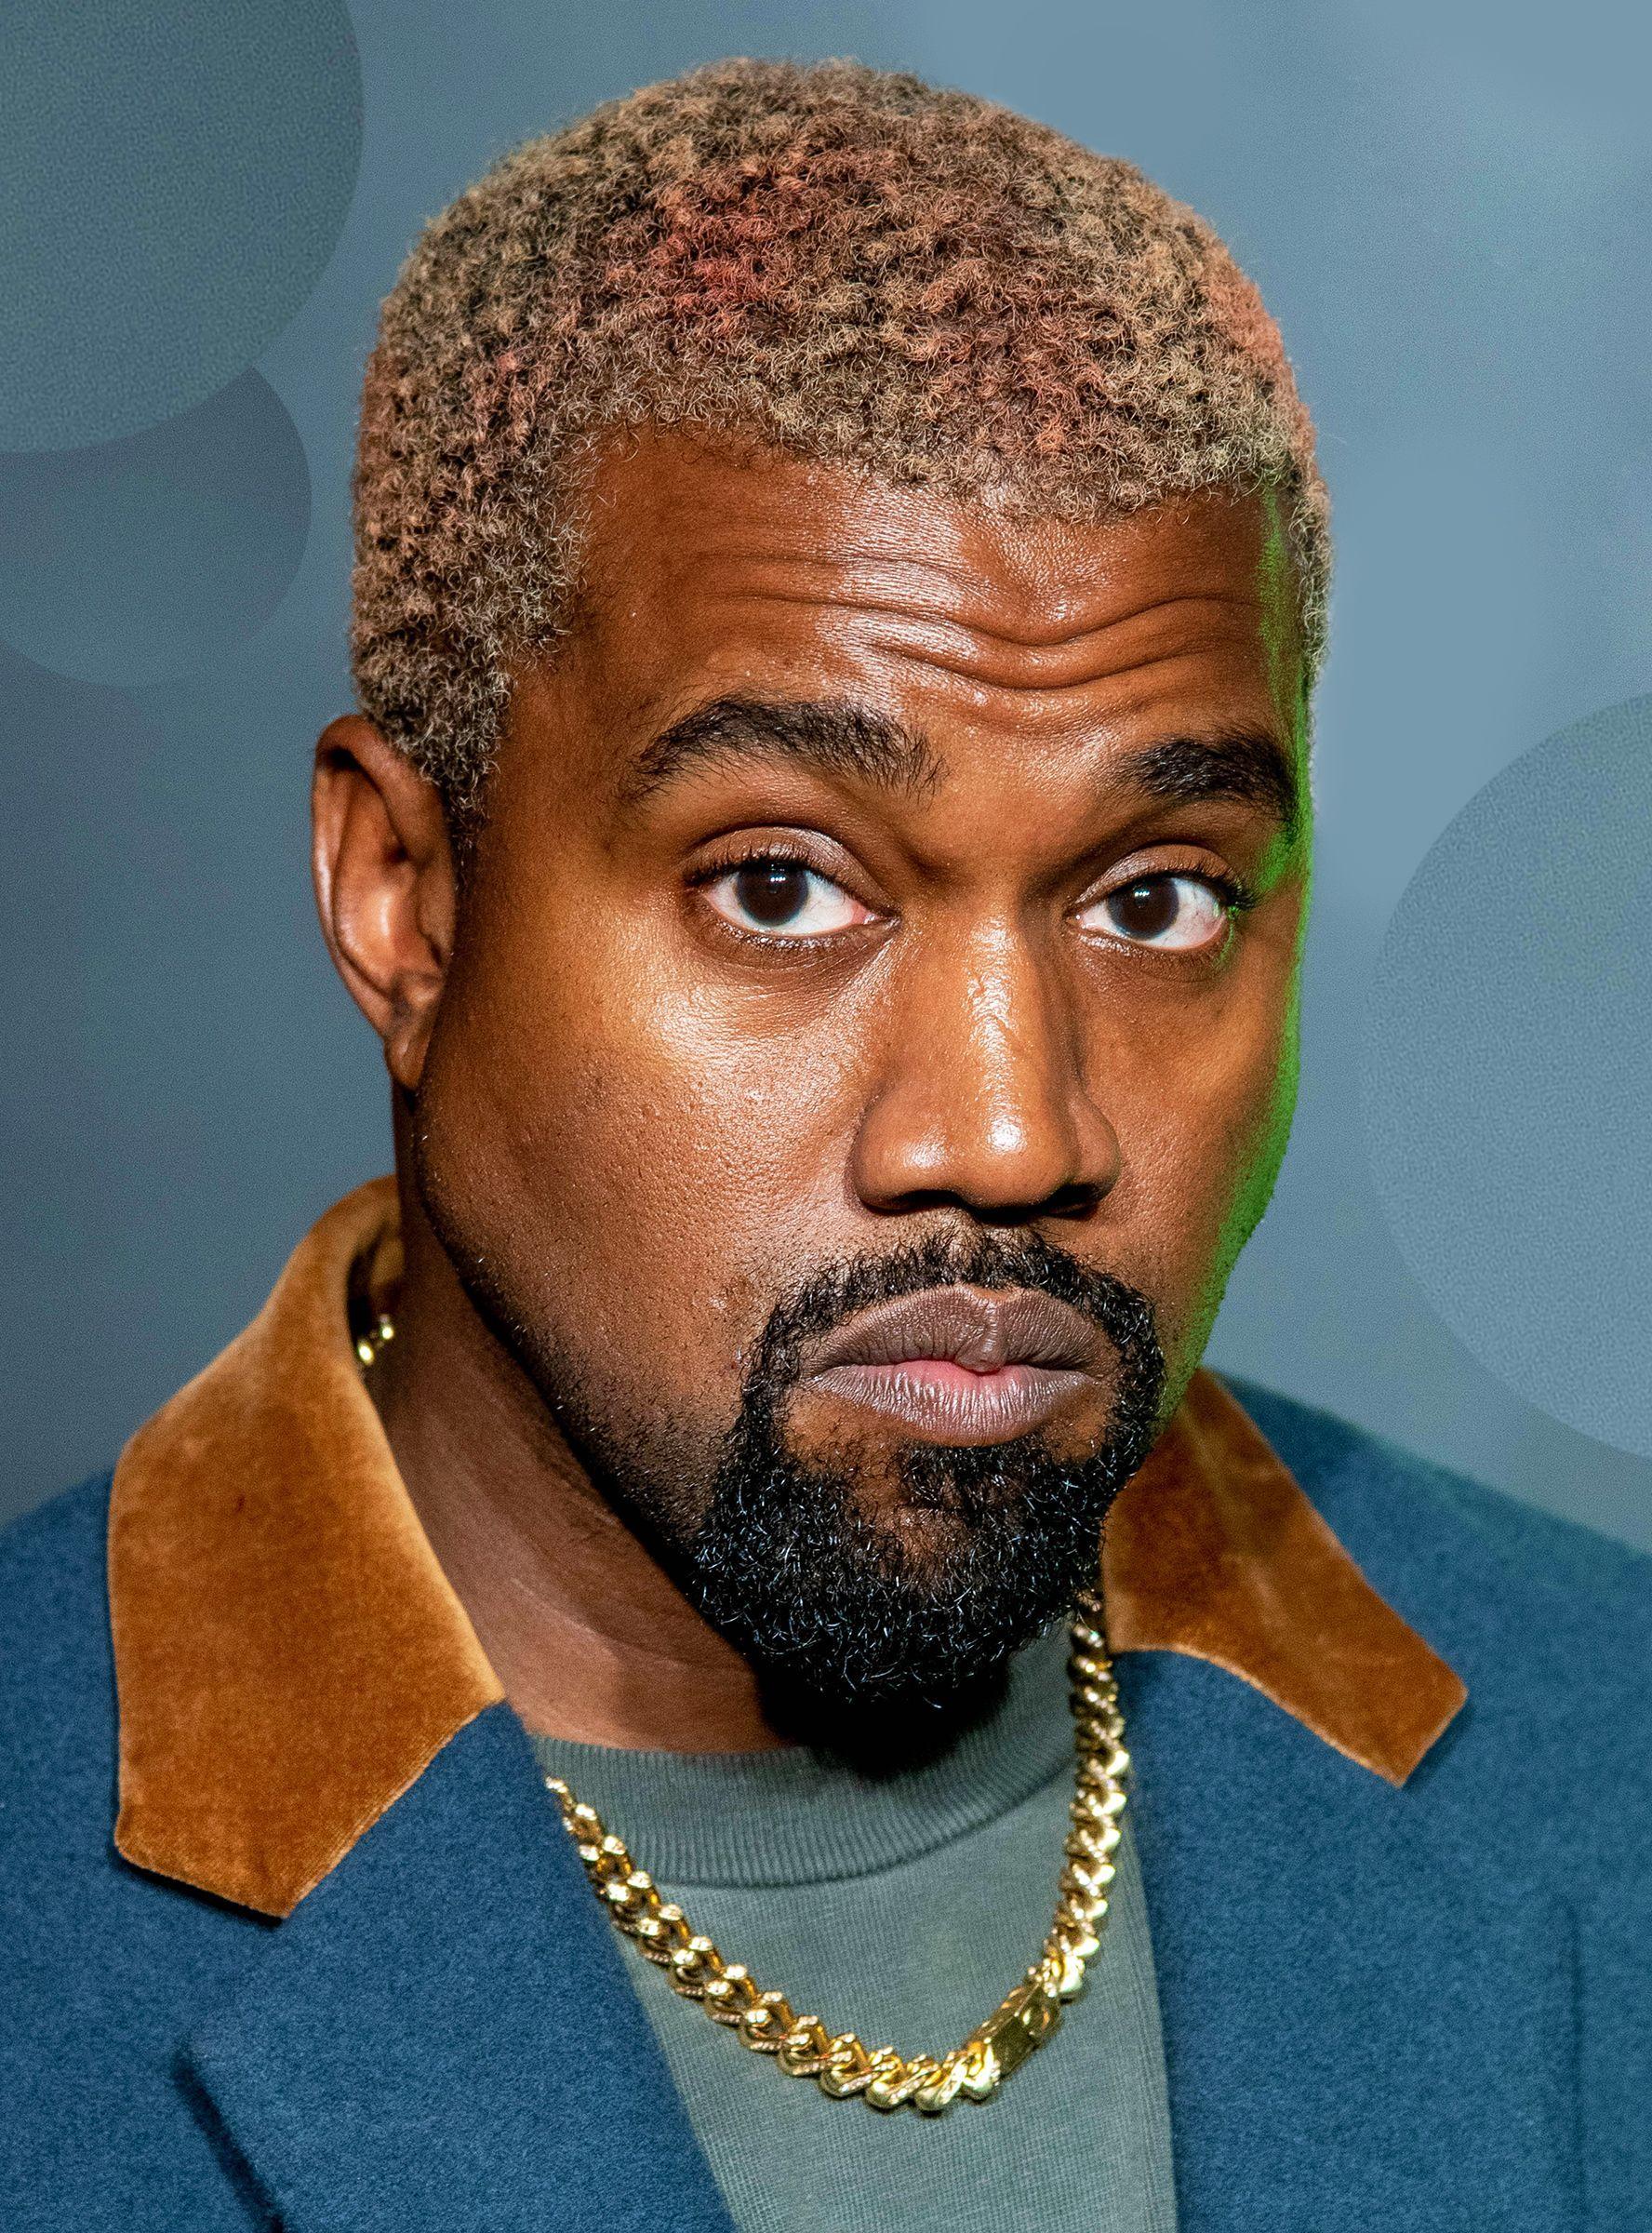 Kanye West S New Hairstyle Has Split The Internet Kanye West Hair Luke Evans Boyfriend Kanye West